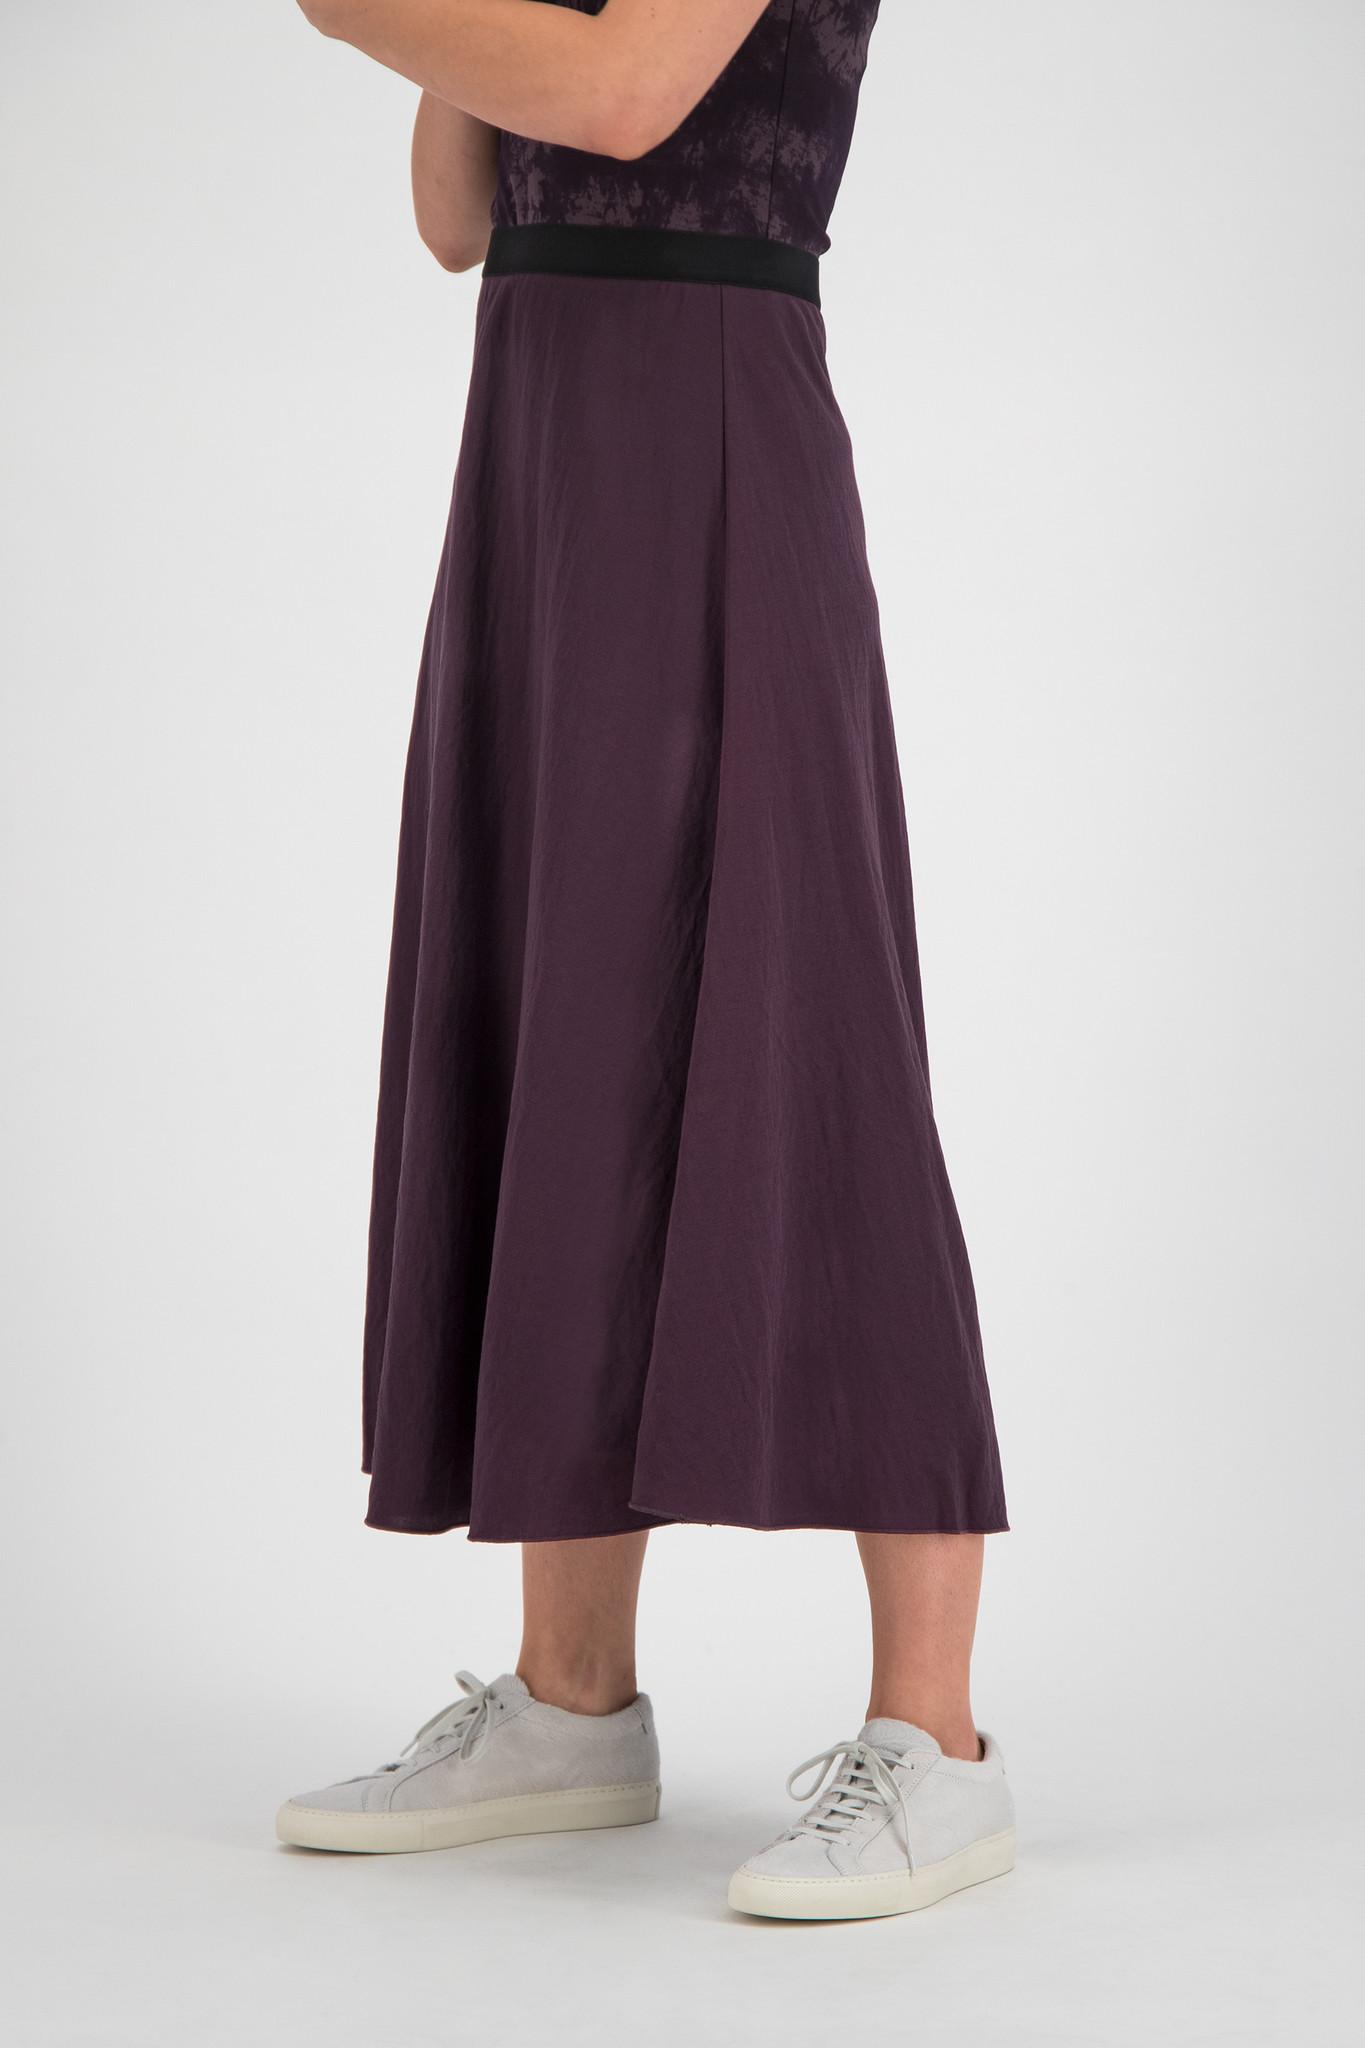 SYLVER Crêpe Stretch Skirt - Choco Wine